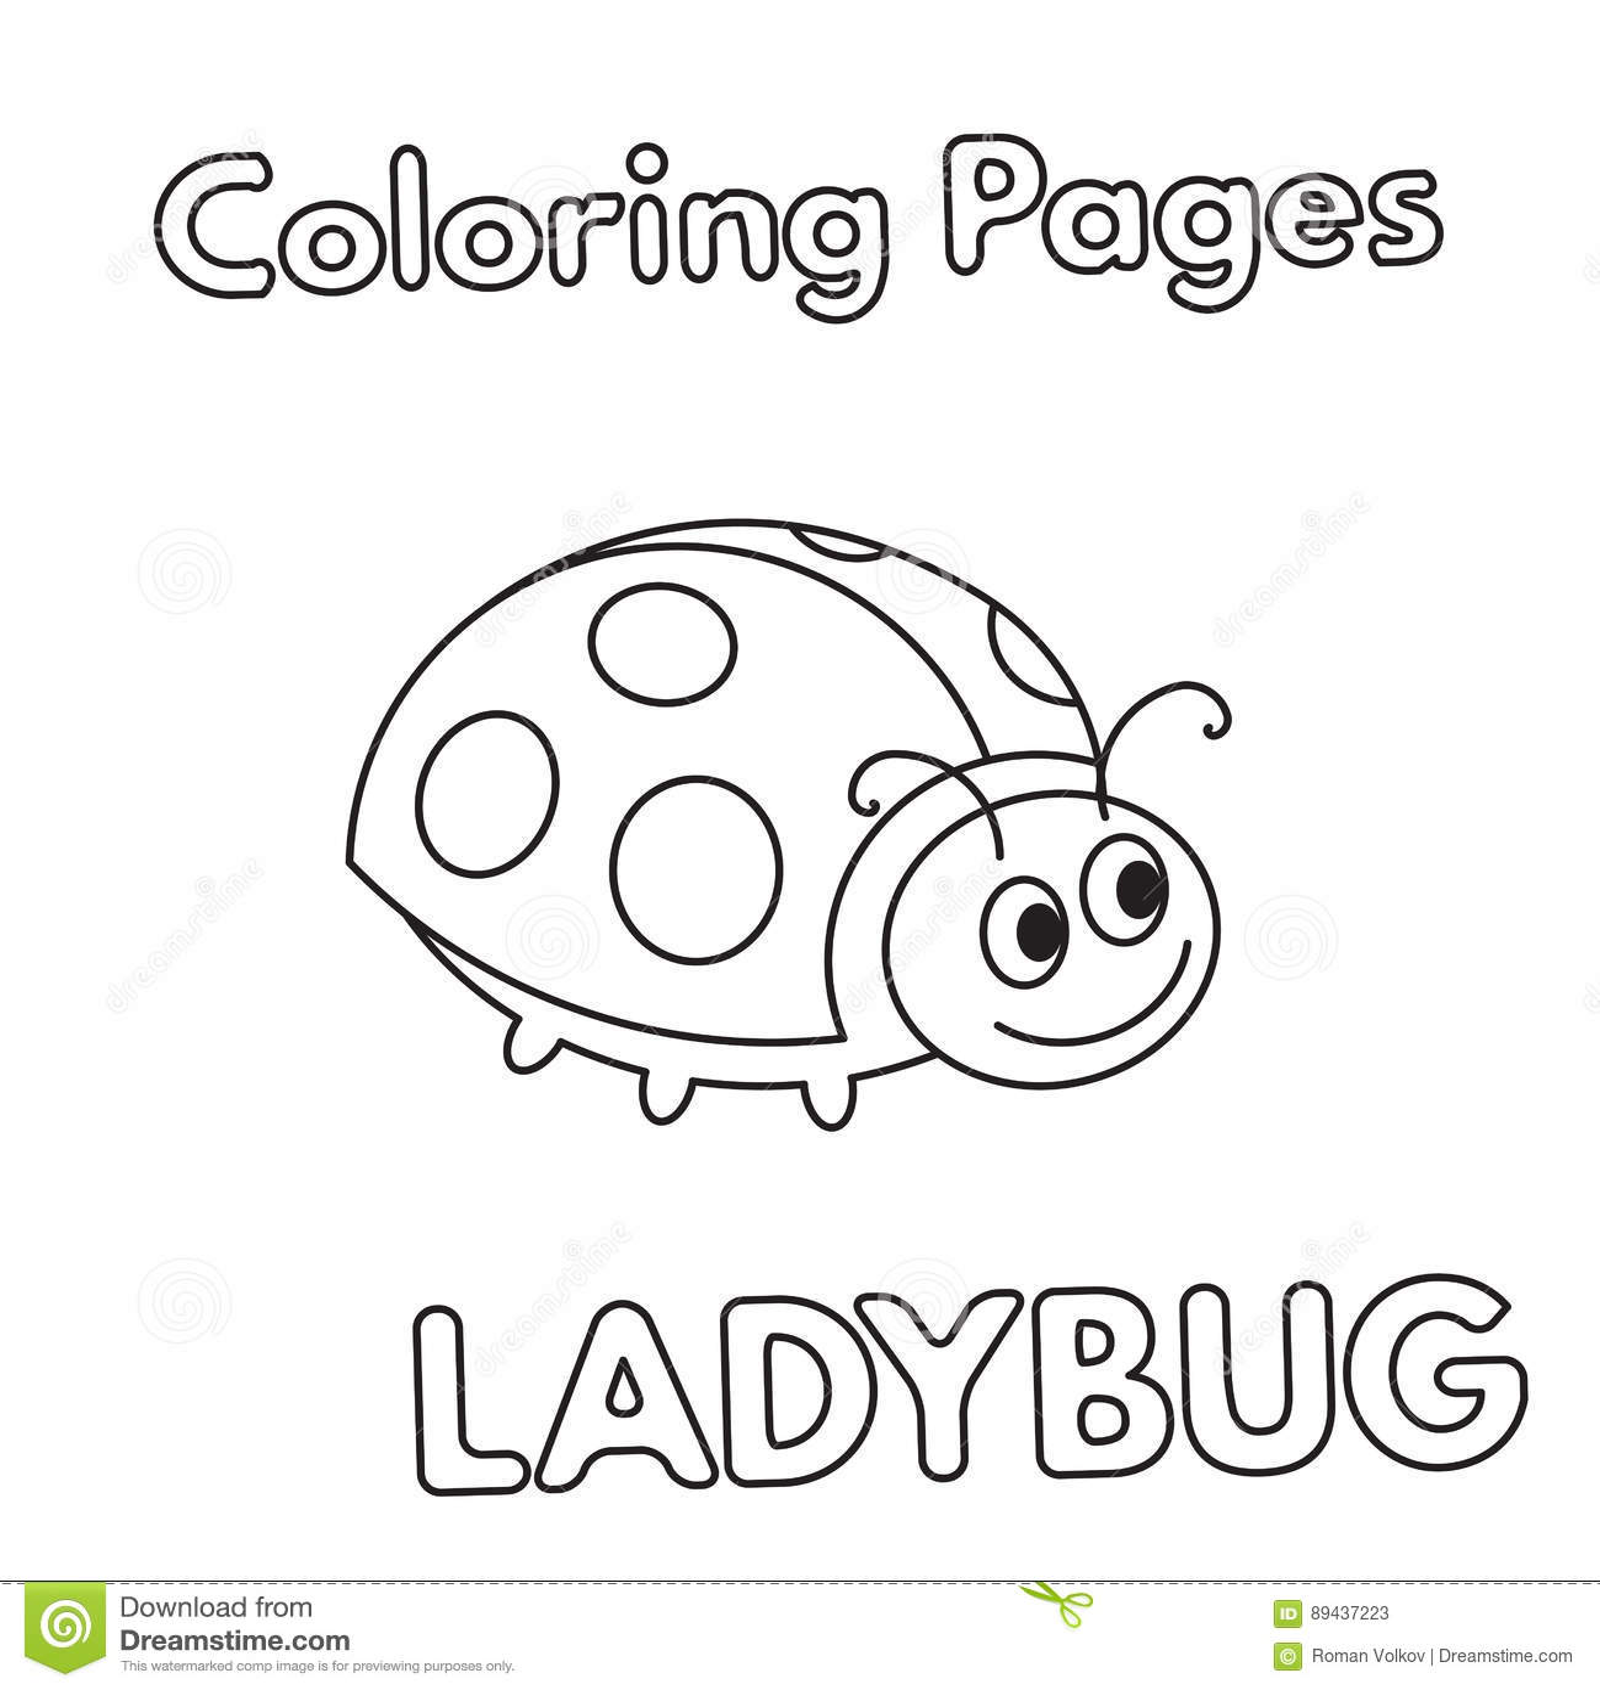 Encantador Libro De Colorear De Mariquita Regalo - Dibujos de ...